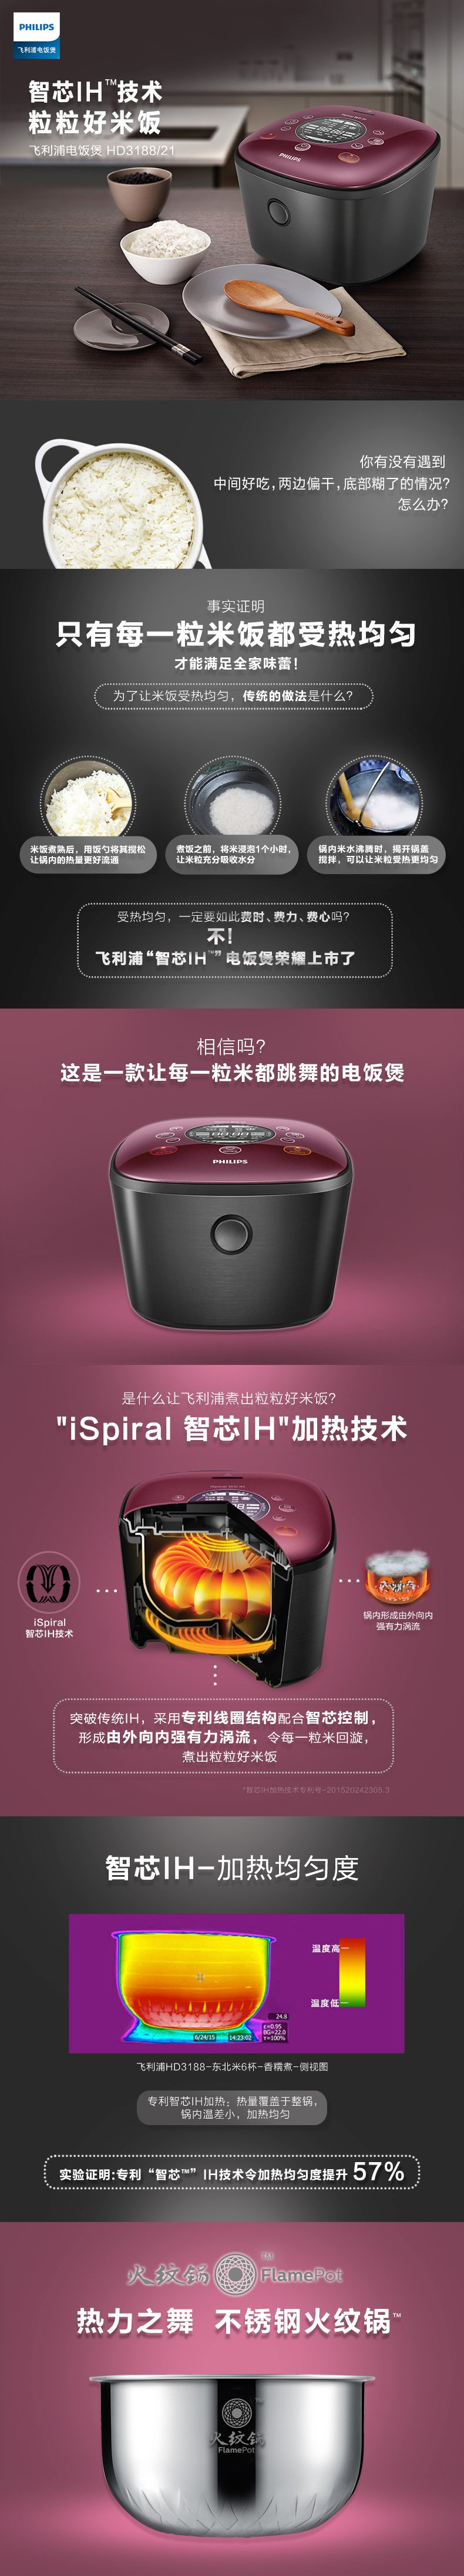 Philips 飞利浦 HD3188/21 智芯IH电饭煲